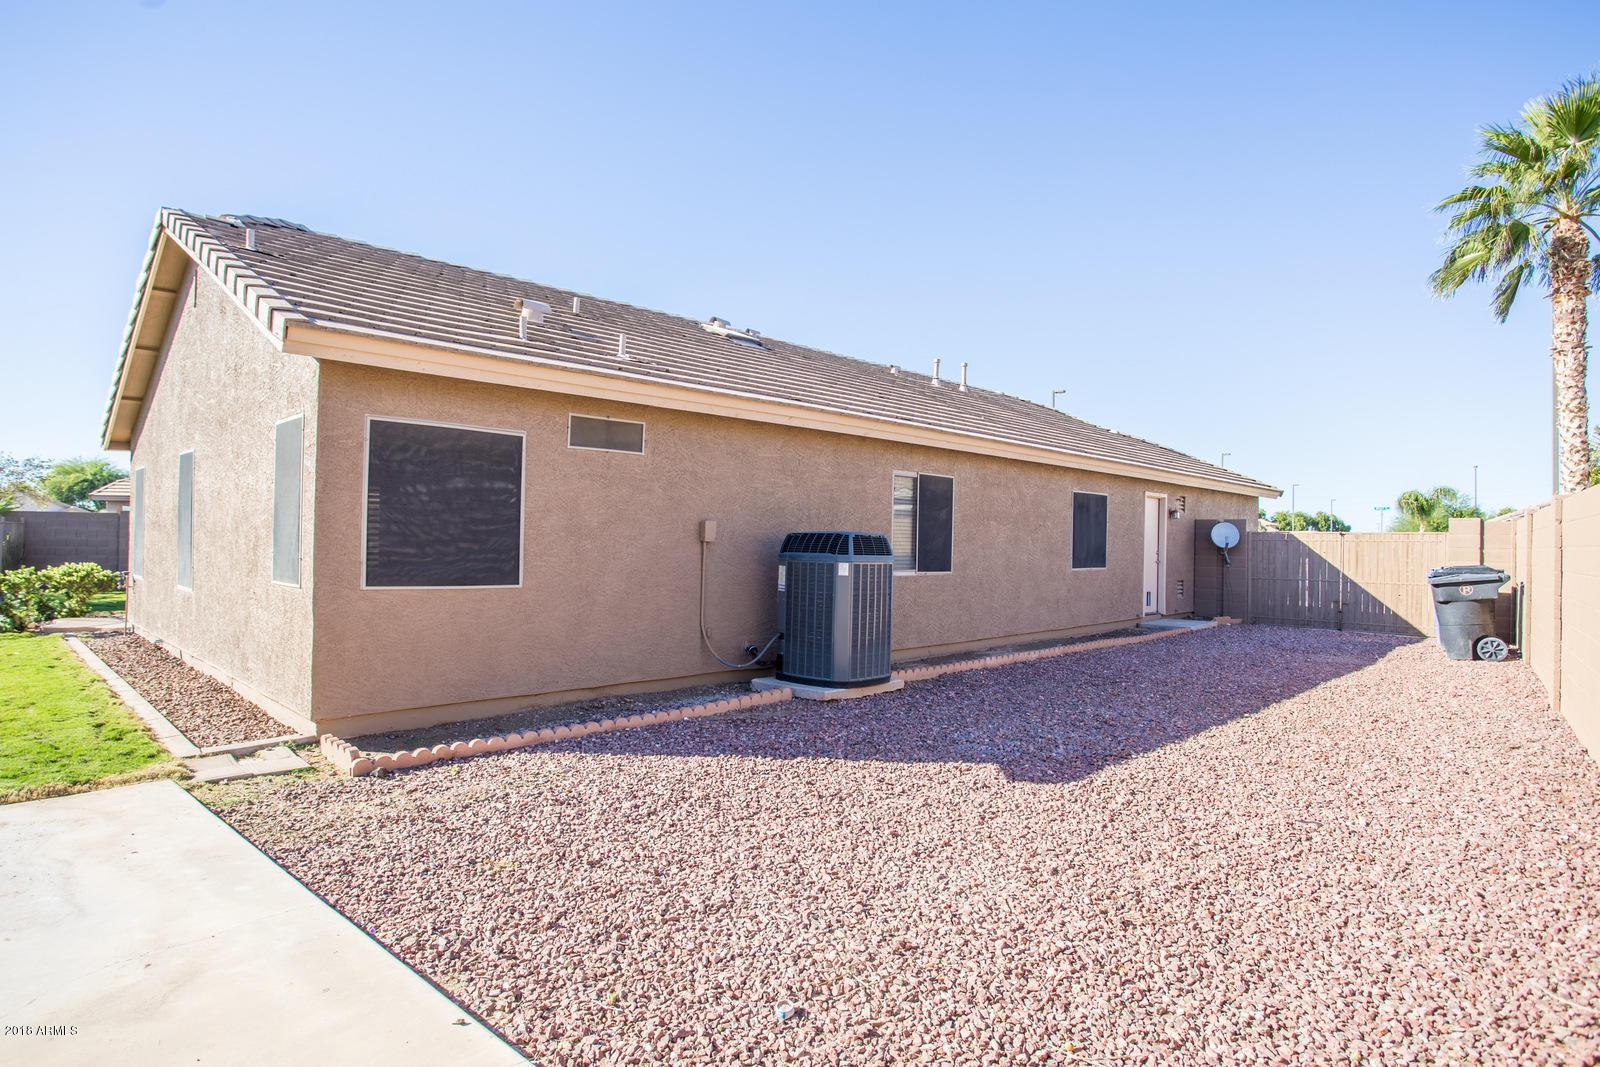 MLS 5836128 3813 E WYATT Way, Gilbert, AZ 85297 San Tan Ranch